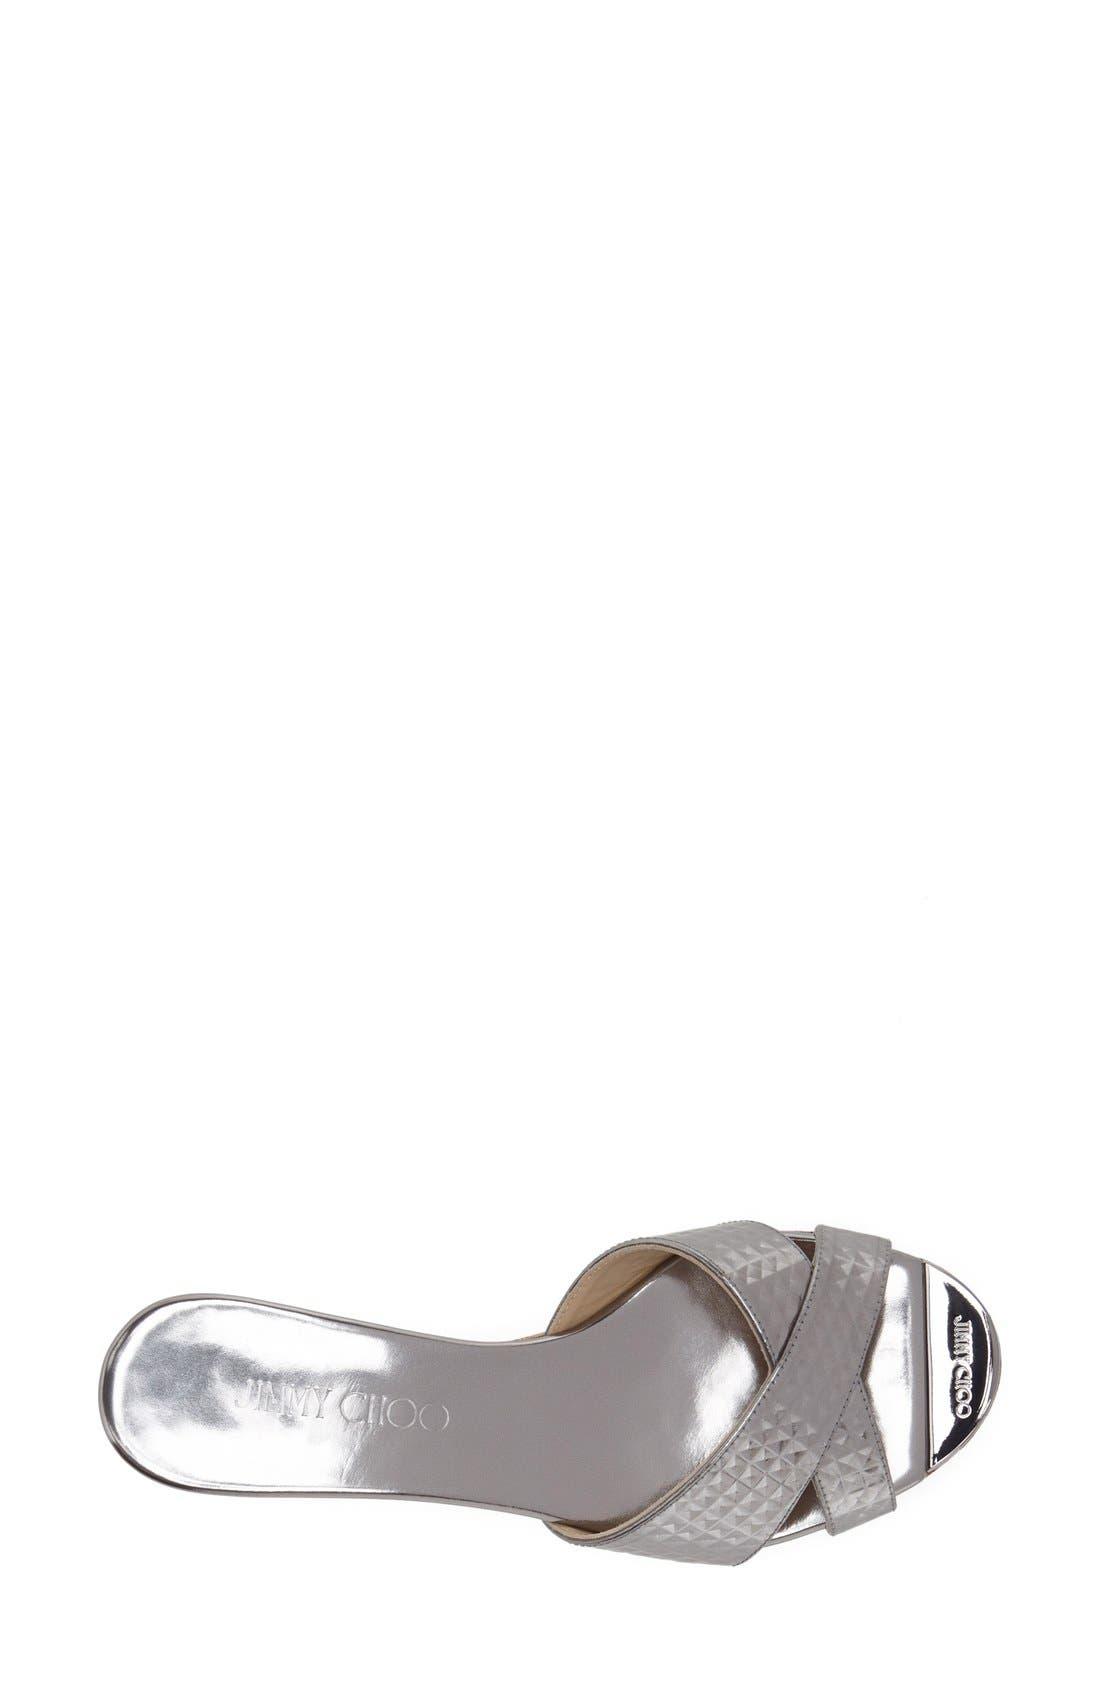 'Panna' Cork Wedge Slide Sandal,                             Alternate thumbnail 3, color,                             040